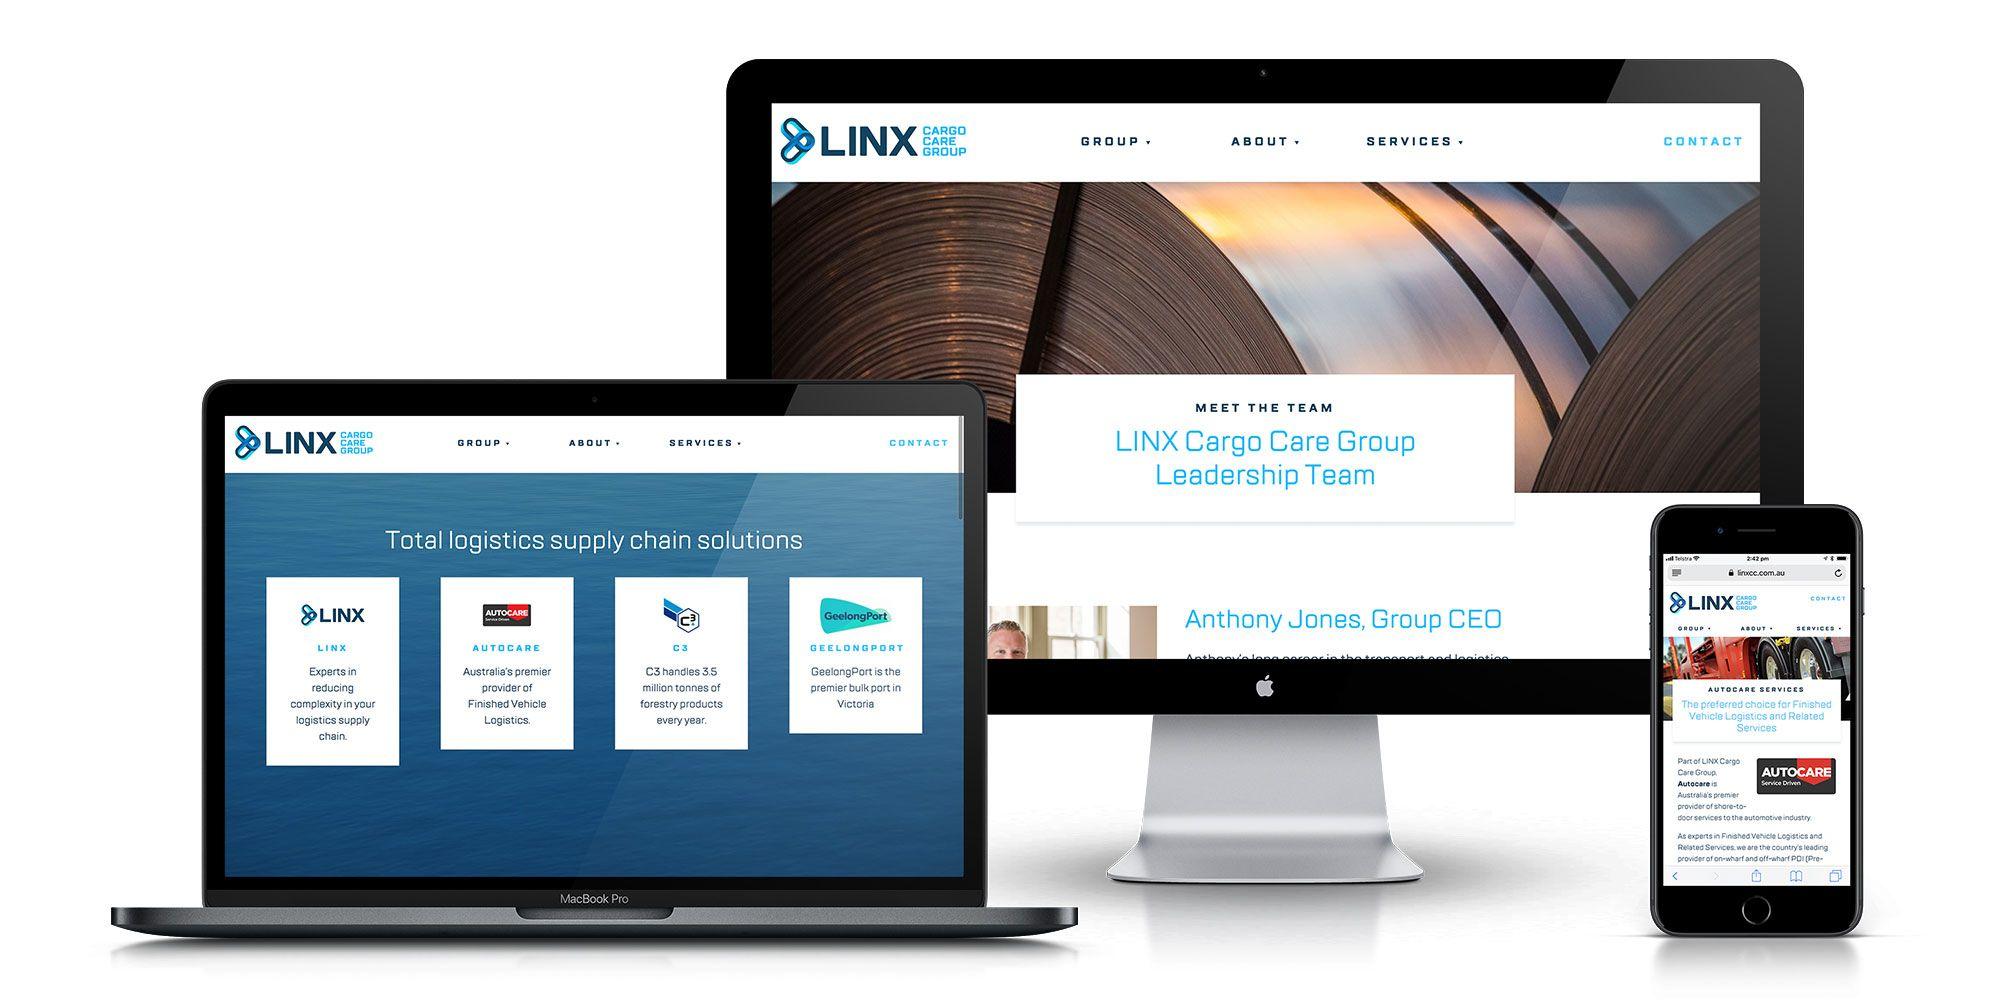 LINX Website Designs